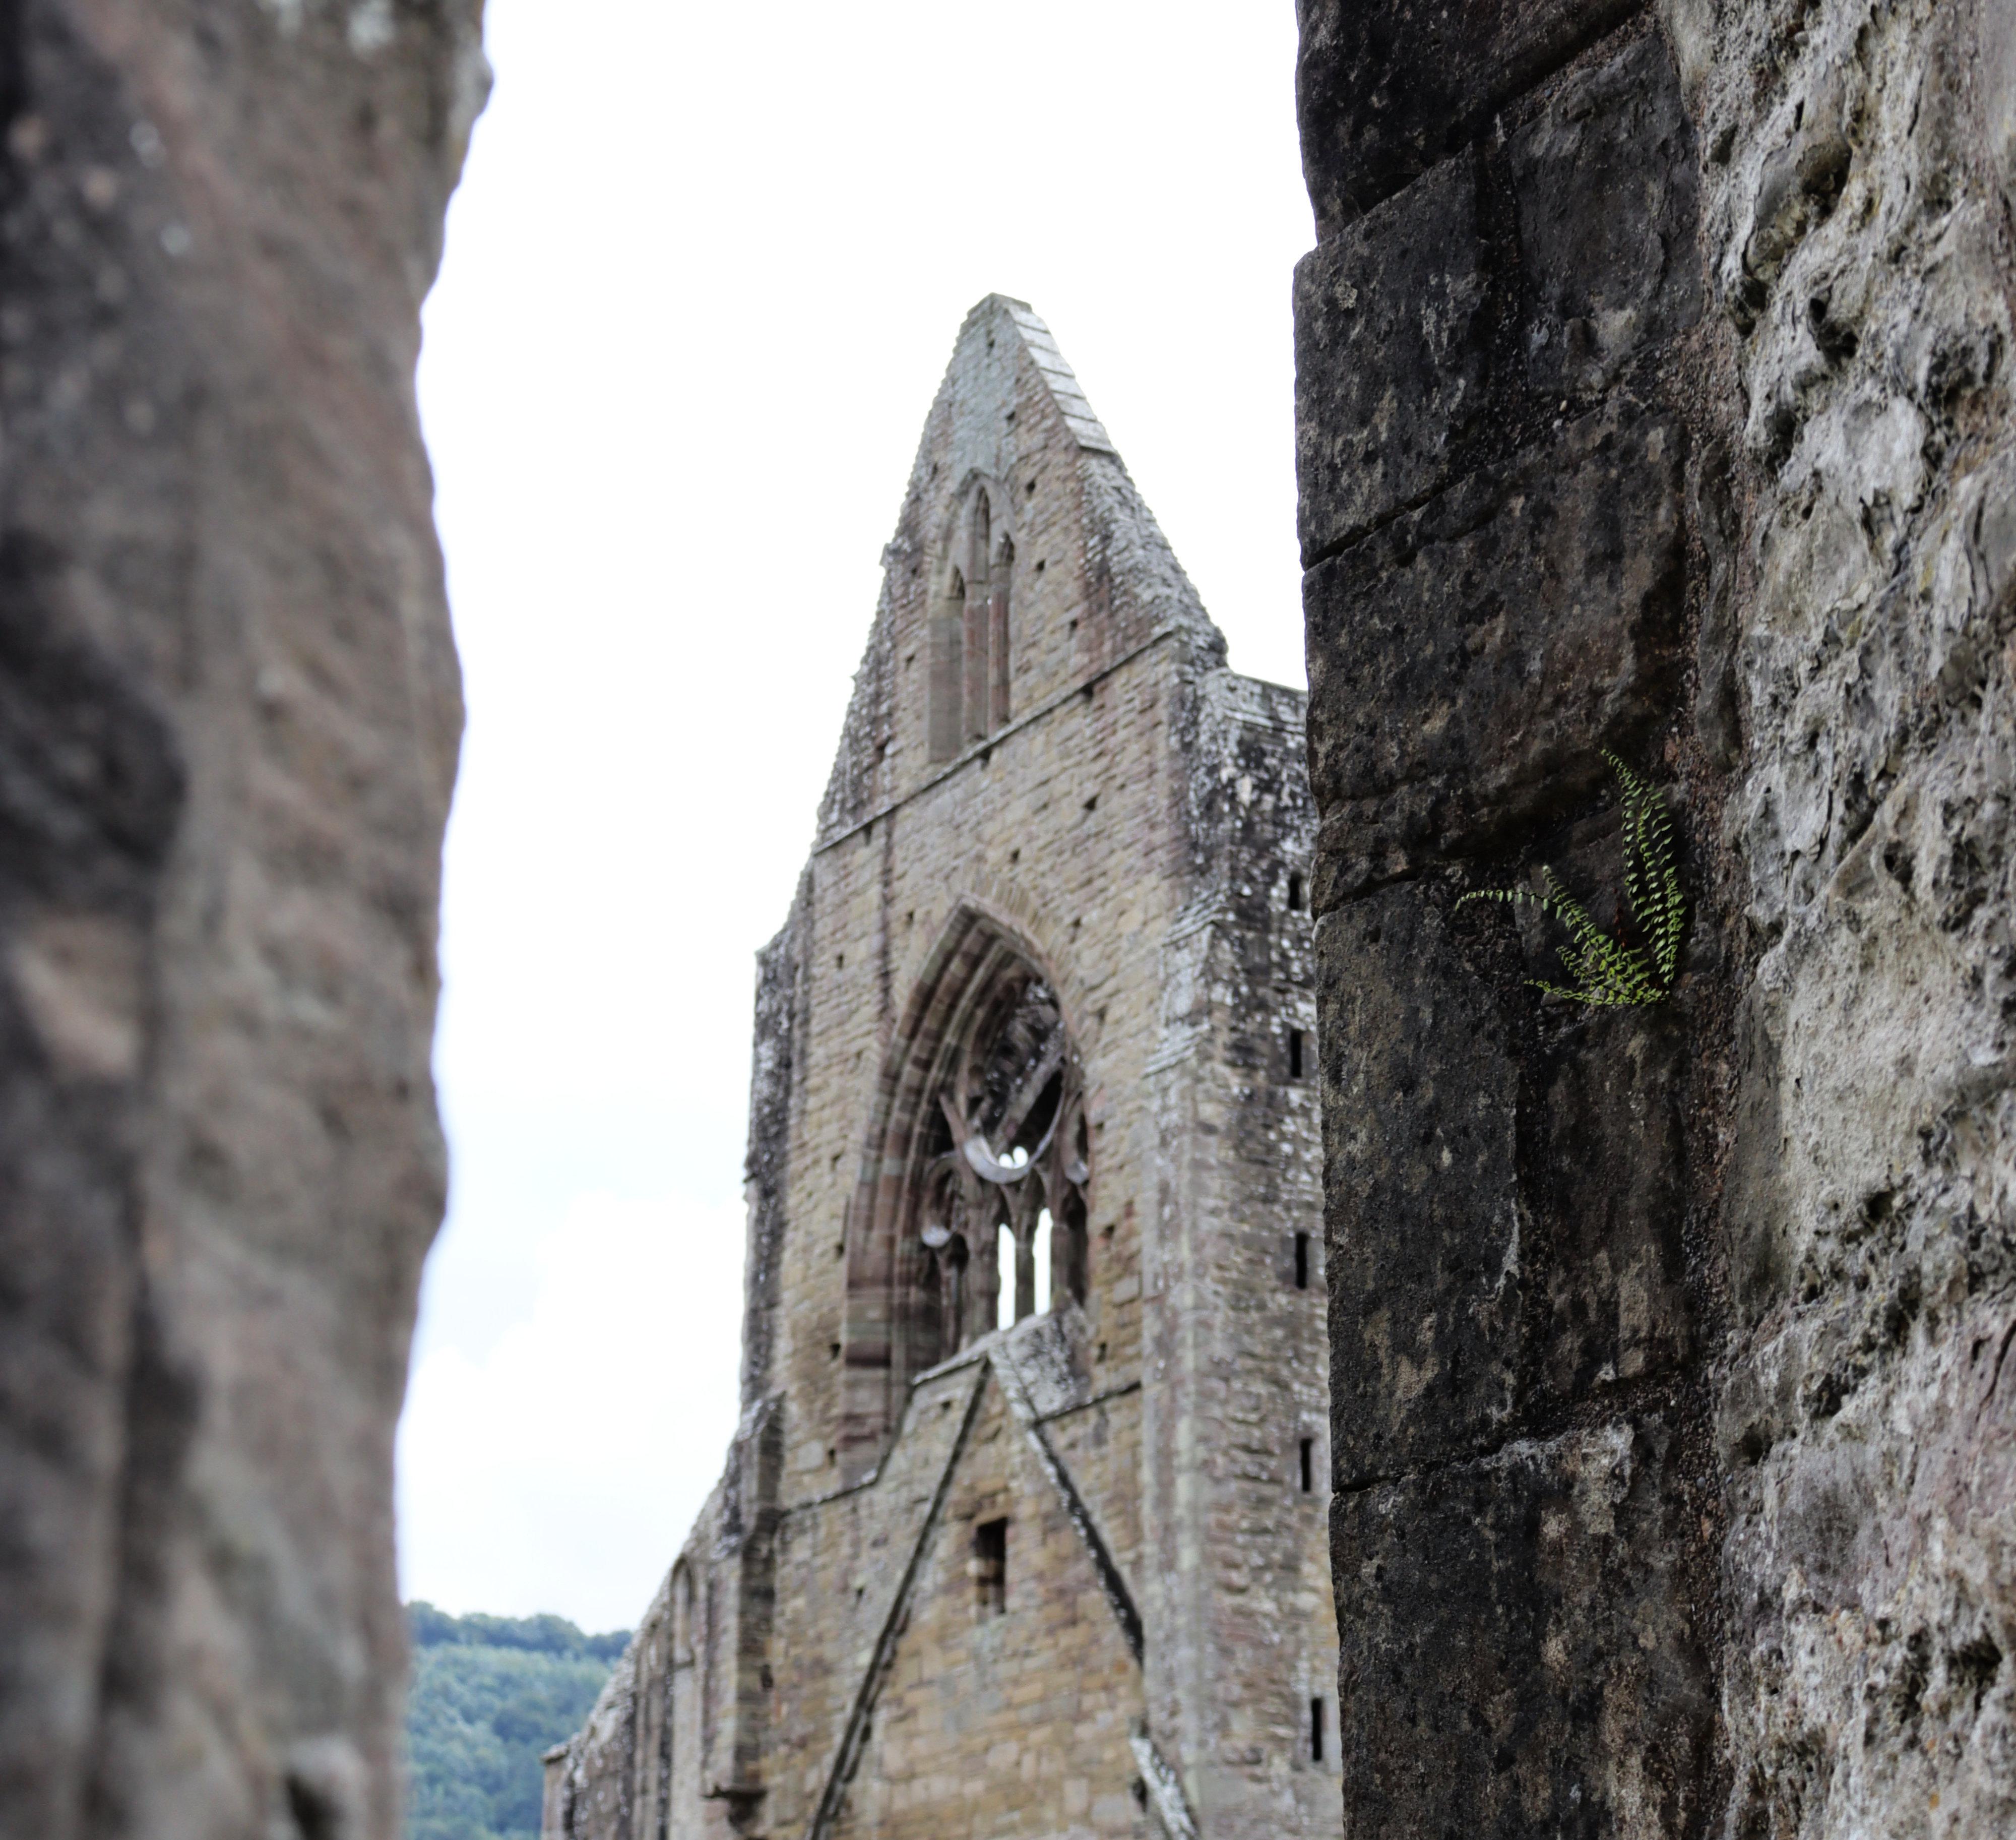 View of Tintern Abbey through a gap between walls.